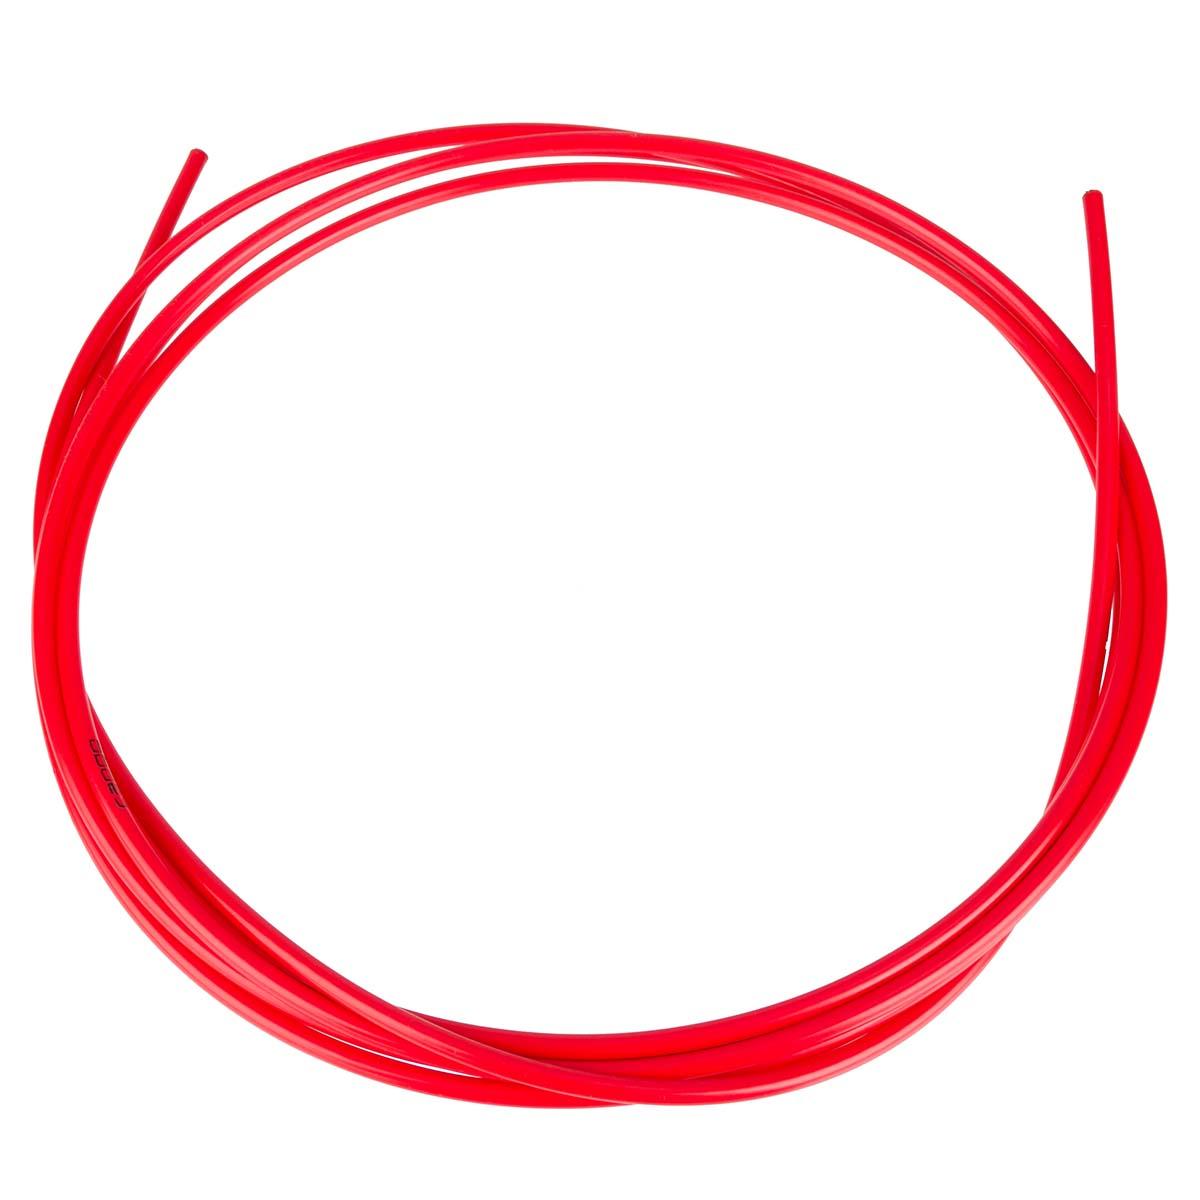 Capgo Cable Systems Schaltaußenhülle Blue Line Rot